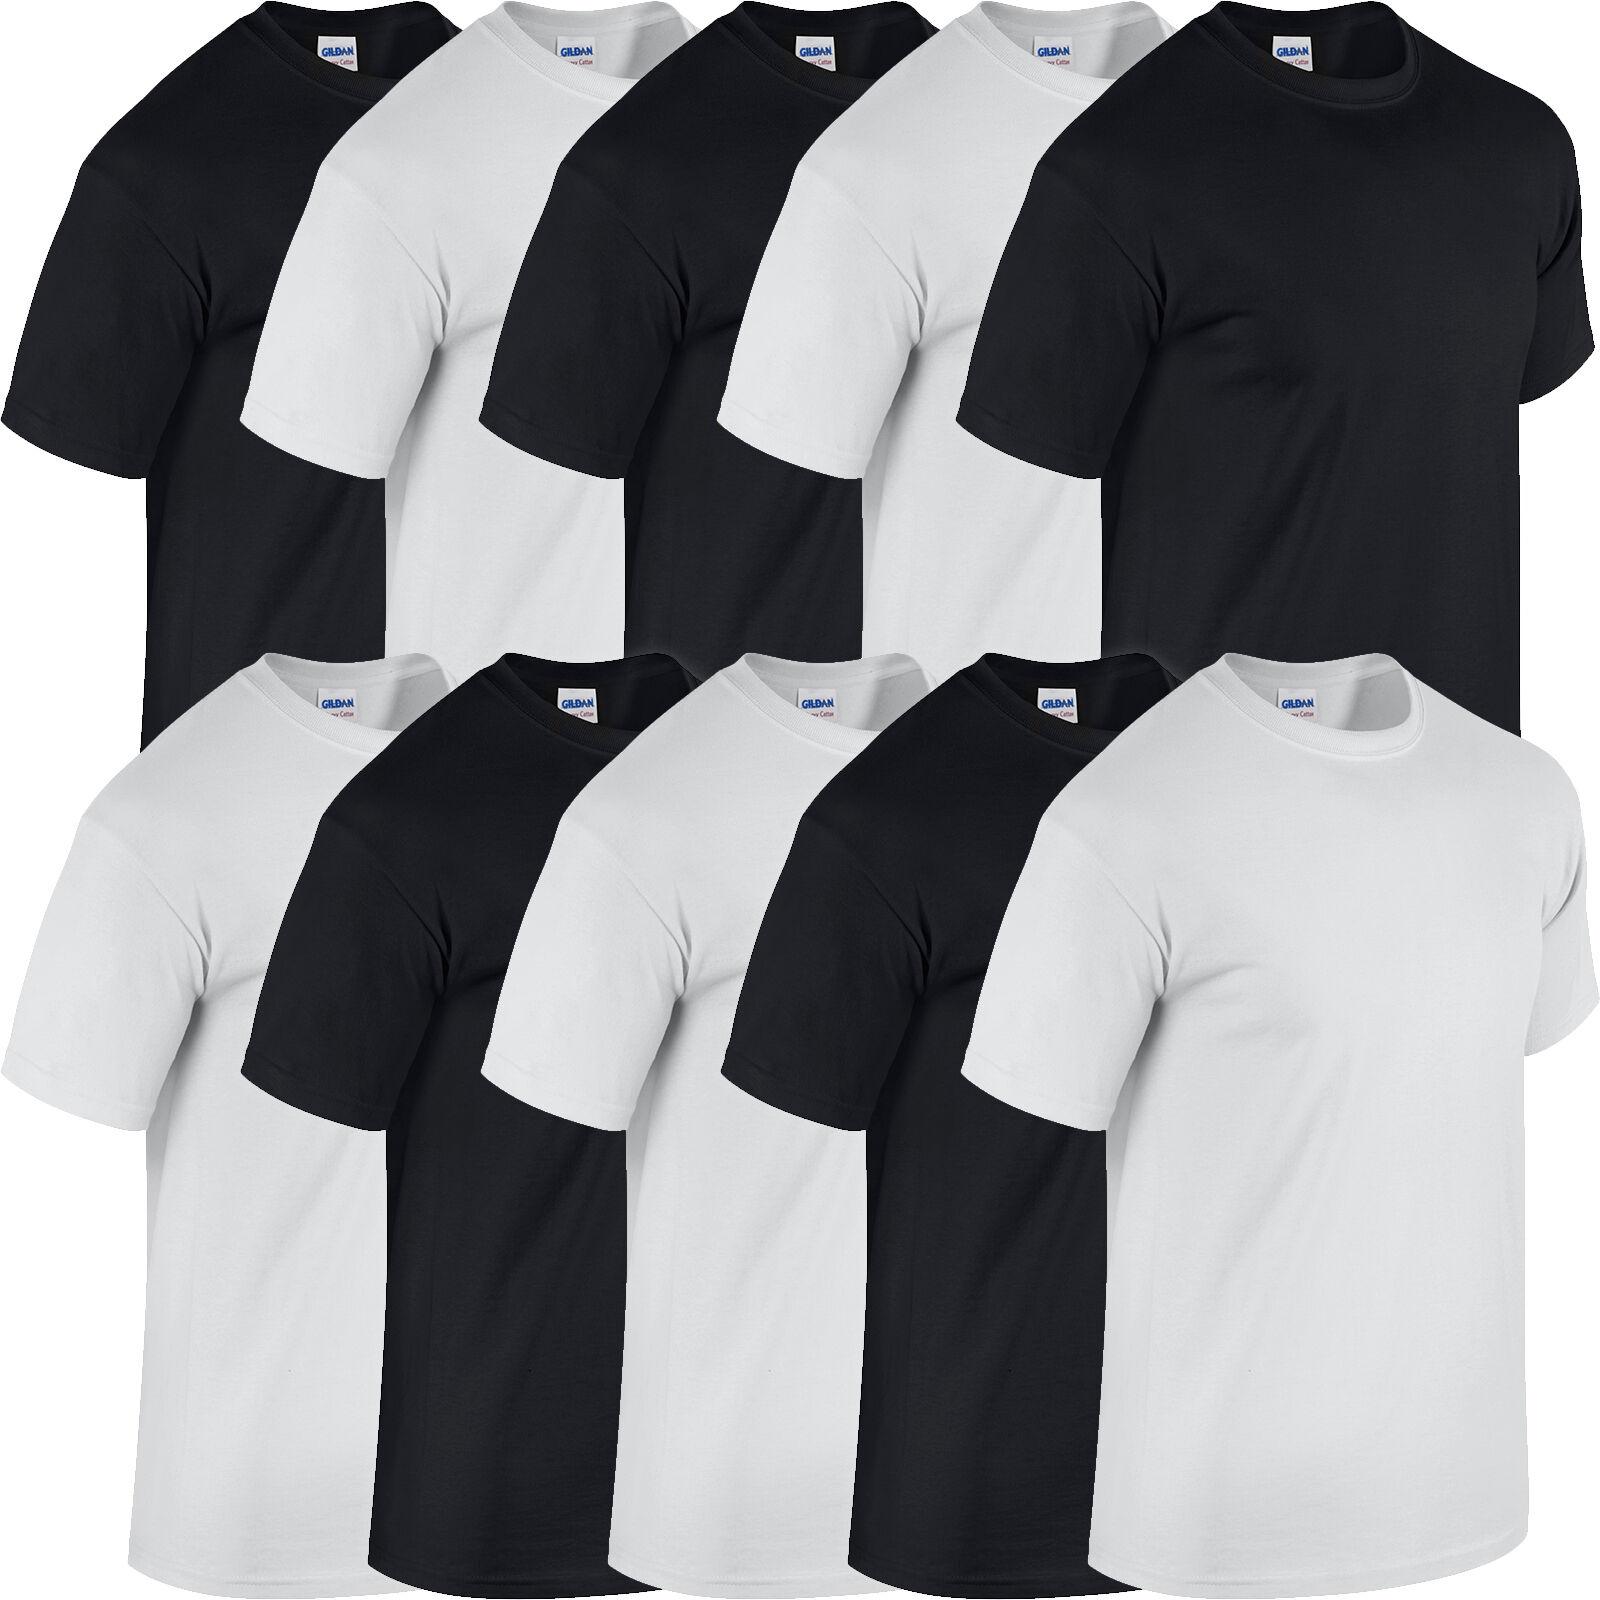 5 x Black and White